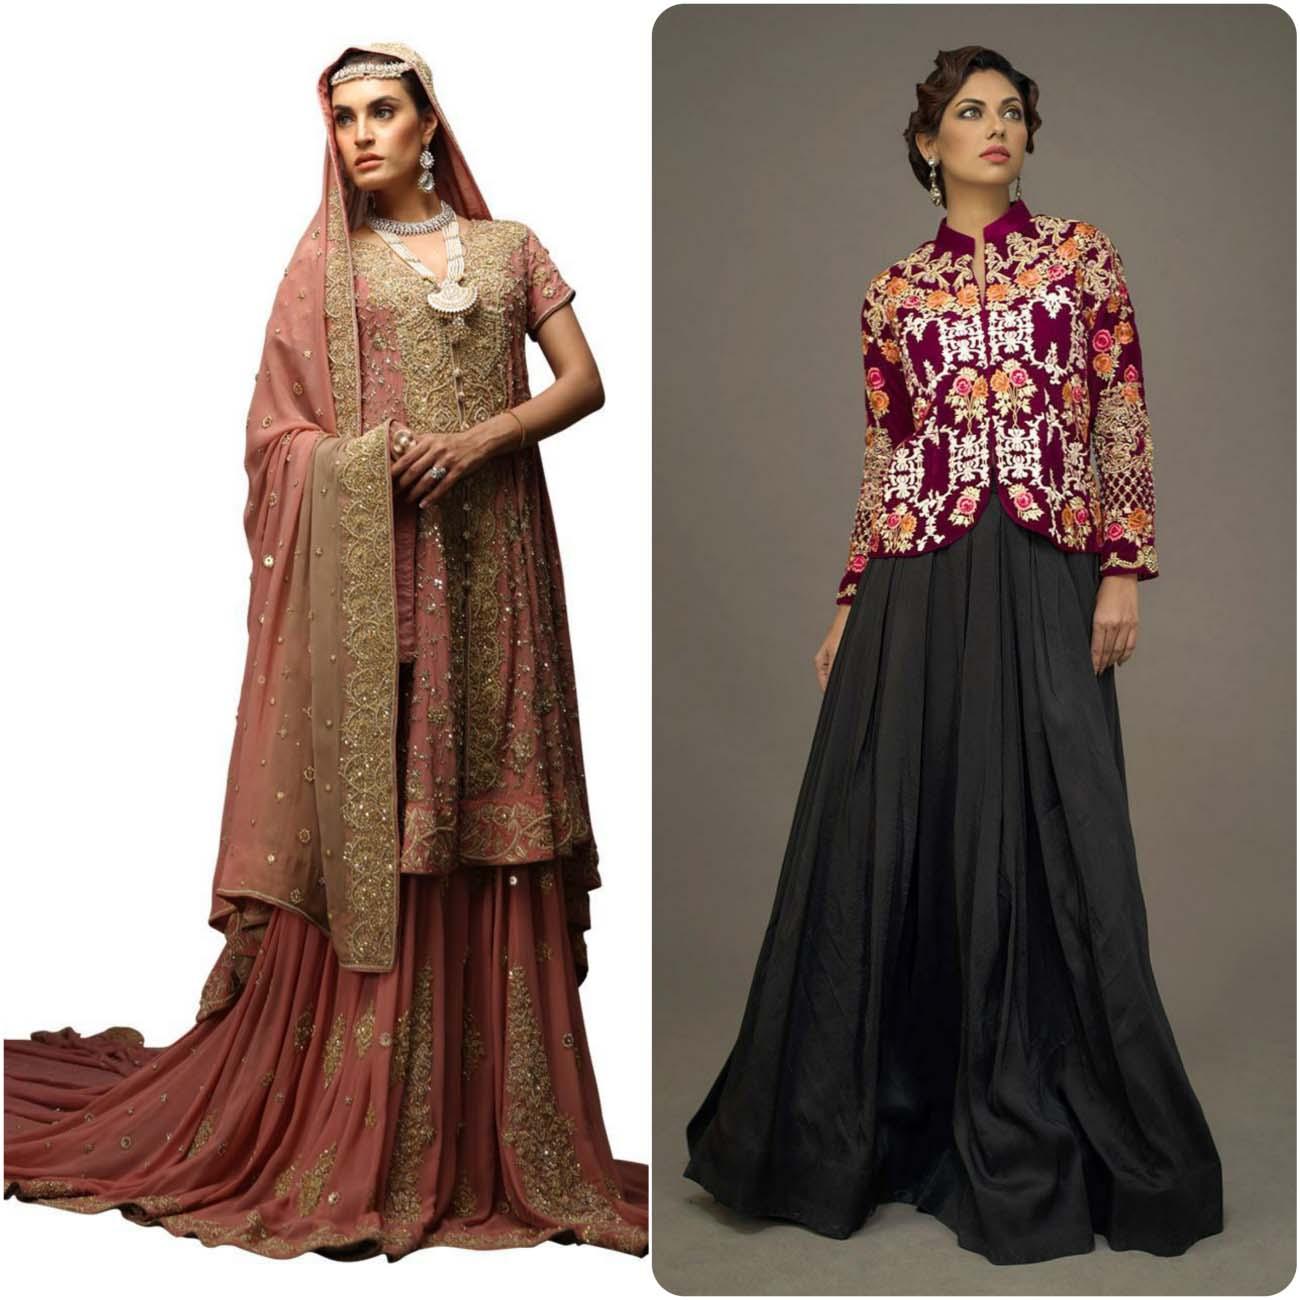 Deepak perwani Wedding Dresses Collection Fo Women 2016-2017...styloplanet (16)